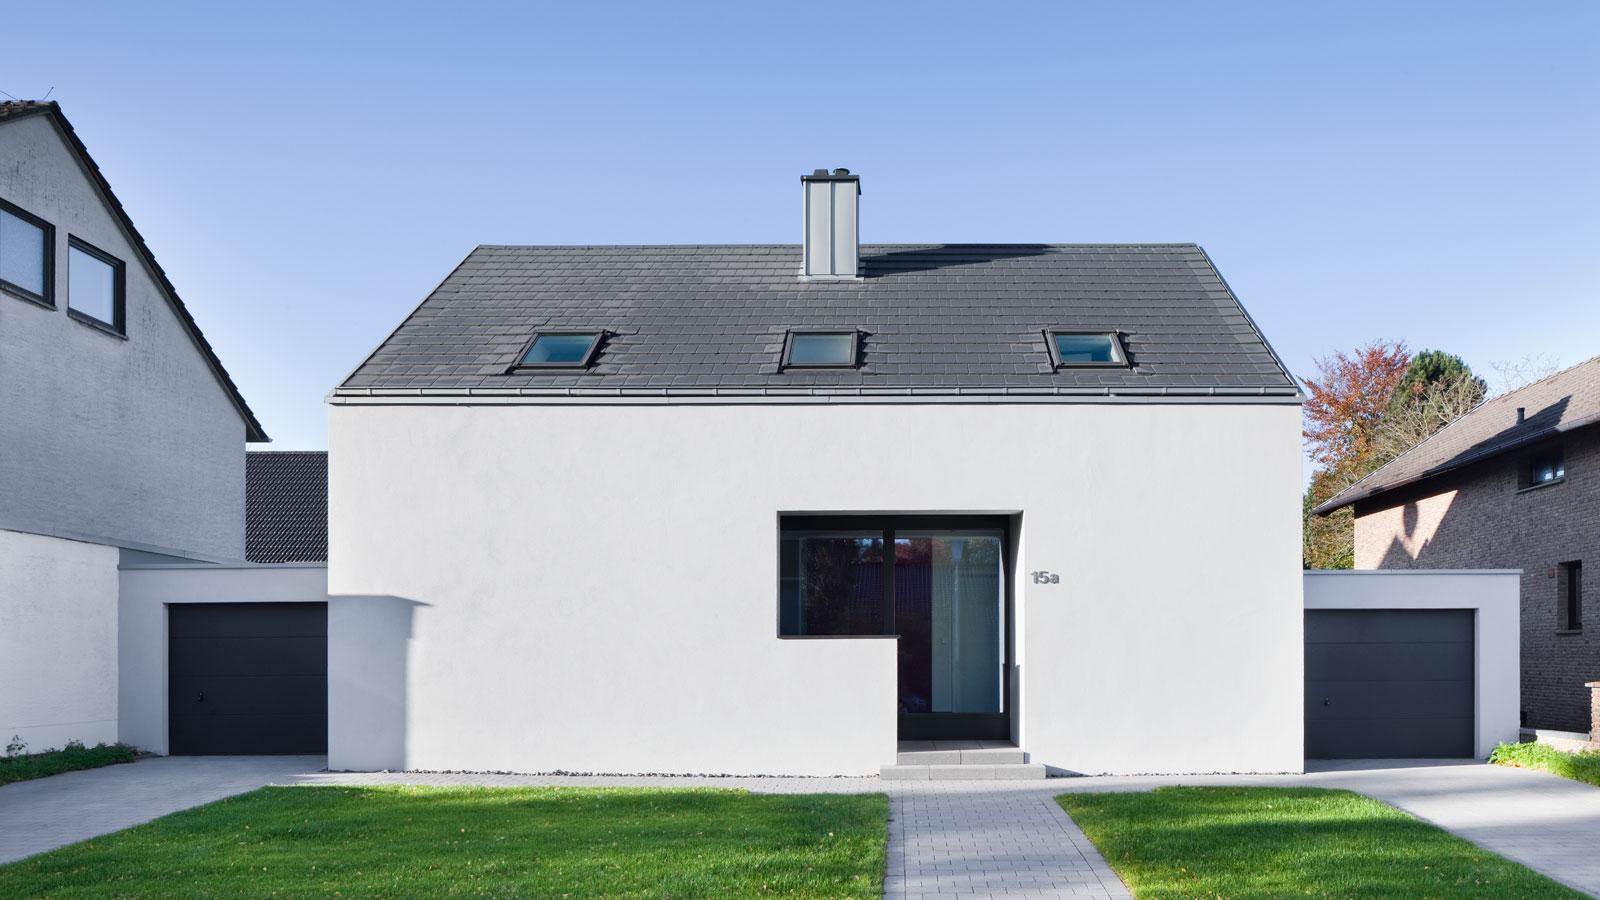 Neubau Einfamilienhaus, Koenigs Rütter Architket